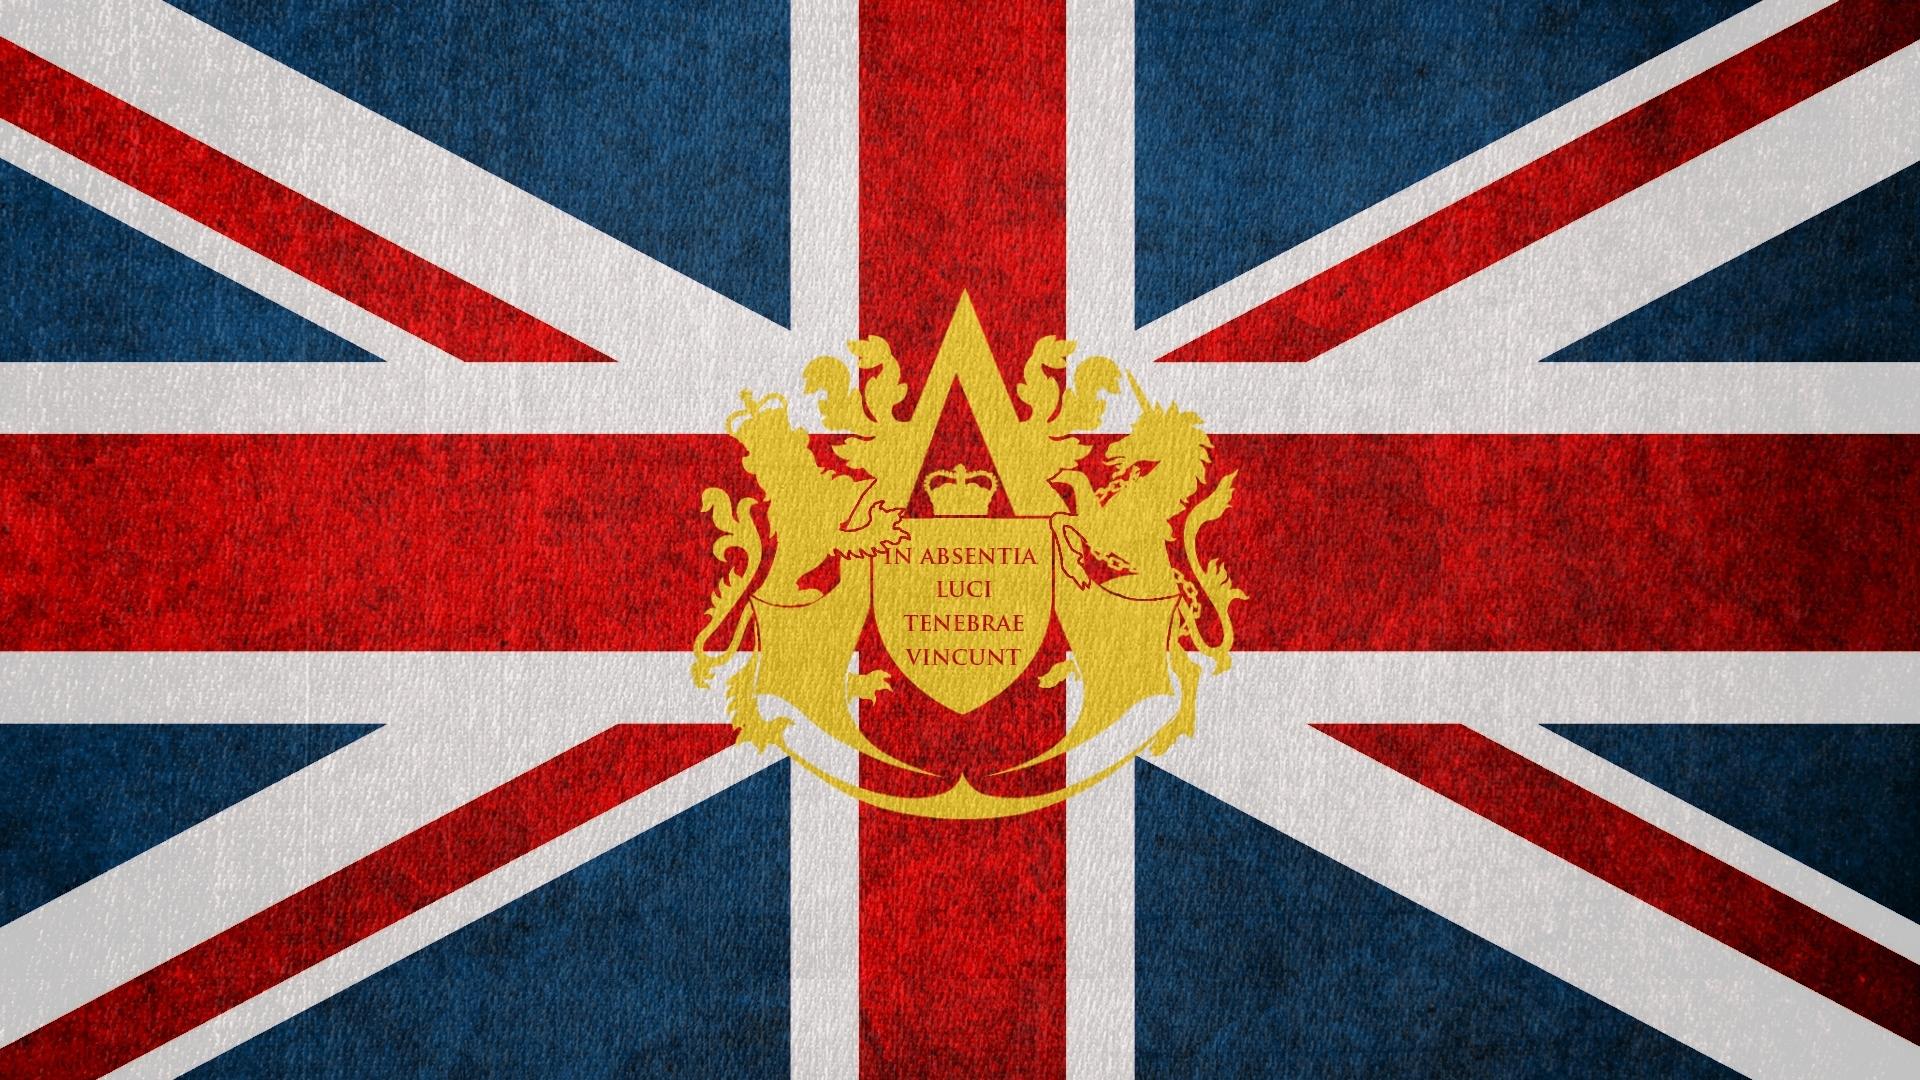 41874 Заставки и Обои Флаги на телефон. Скачать Великобритания (Great Britain), Флаги, Фон картинки бесплатно